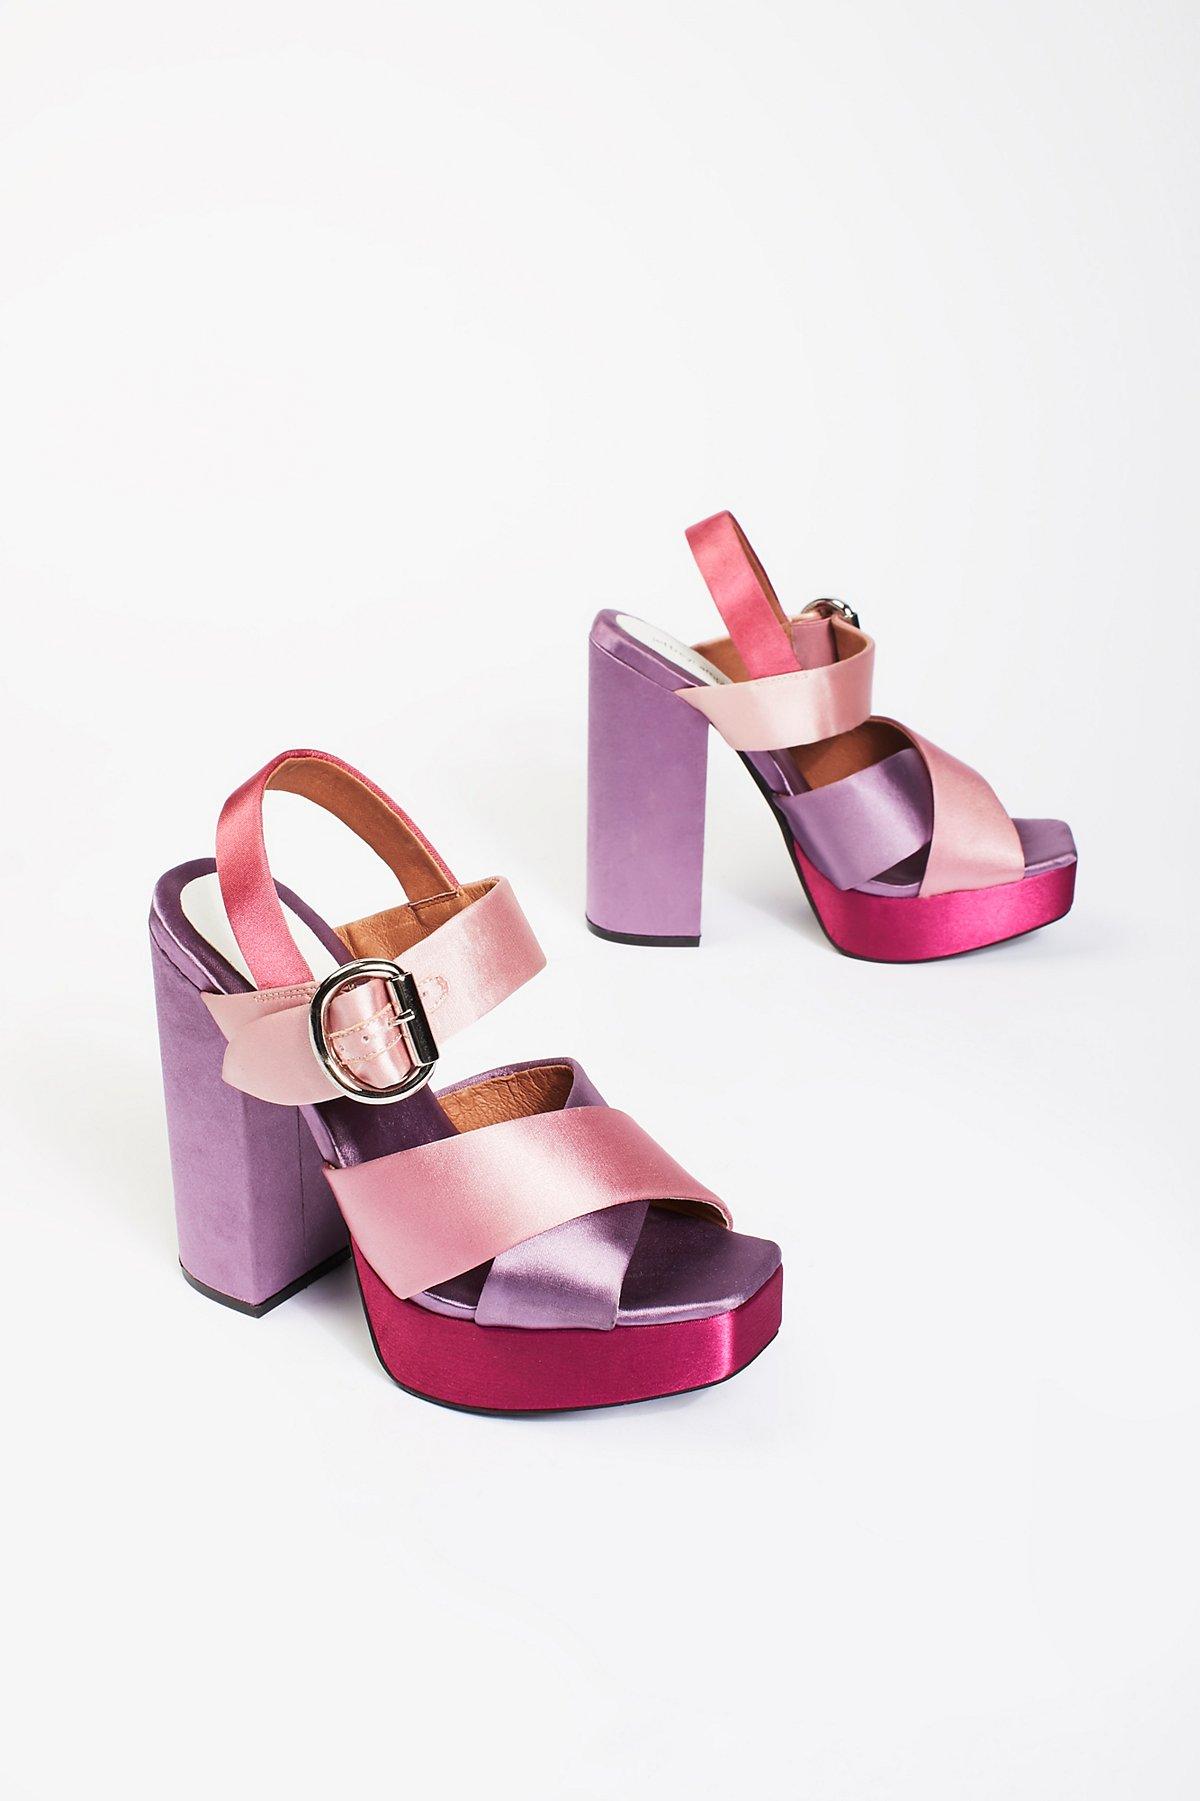 Daze厚底鞋